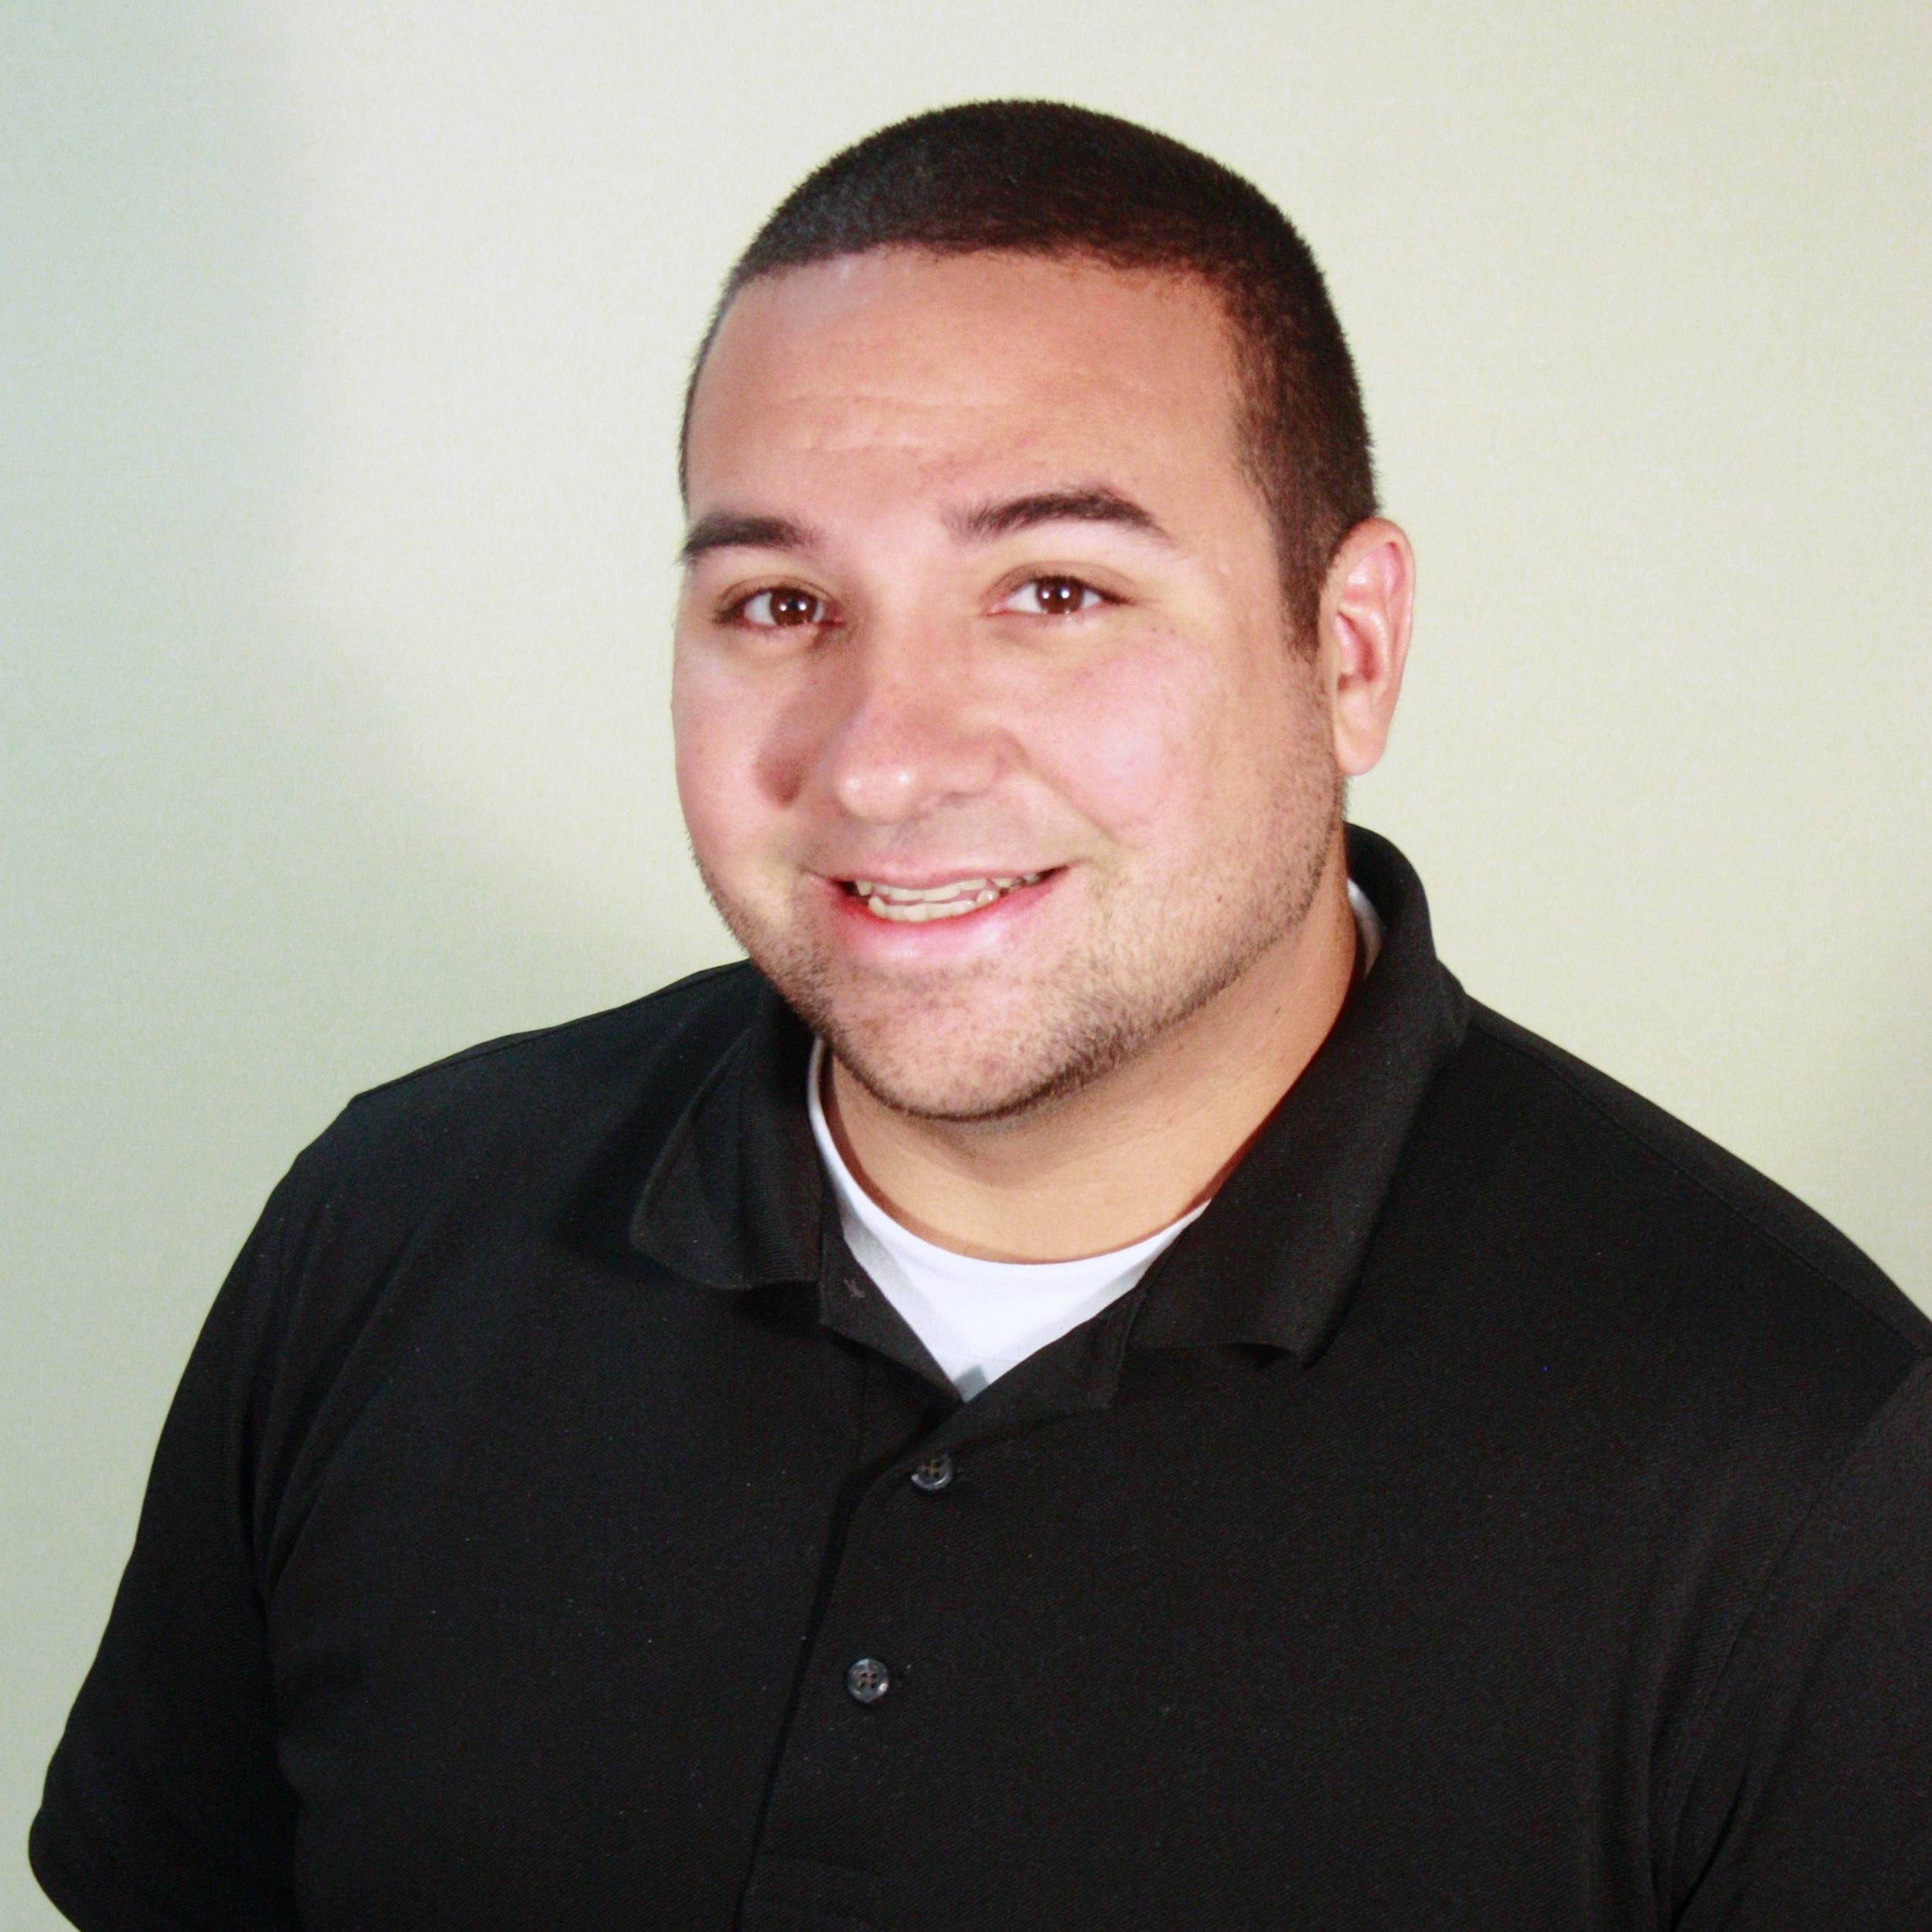 Matt Page - Account Executive